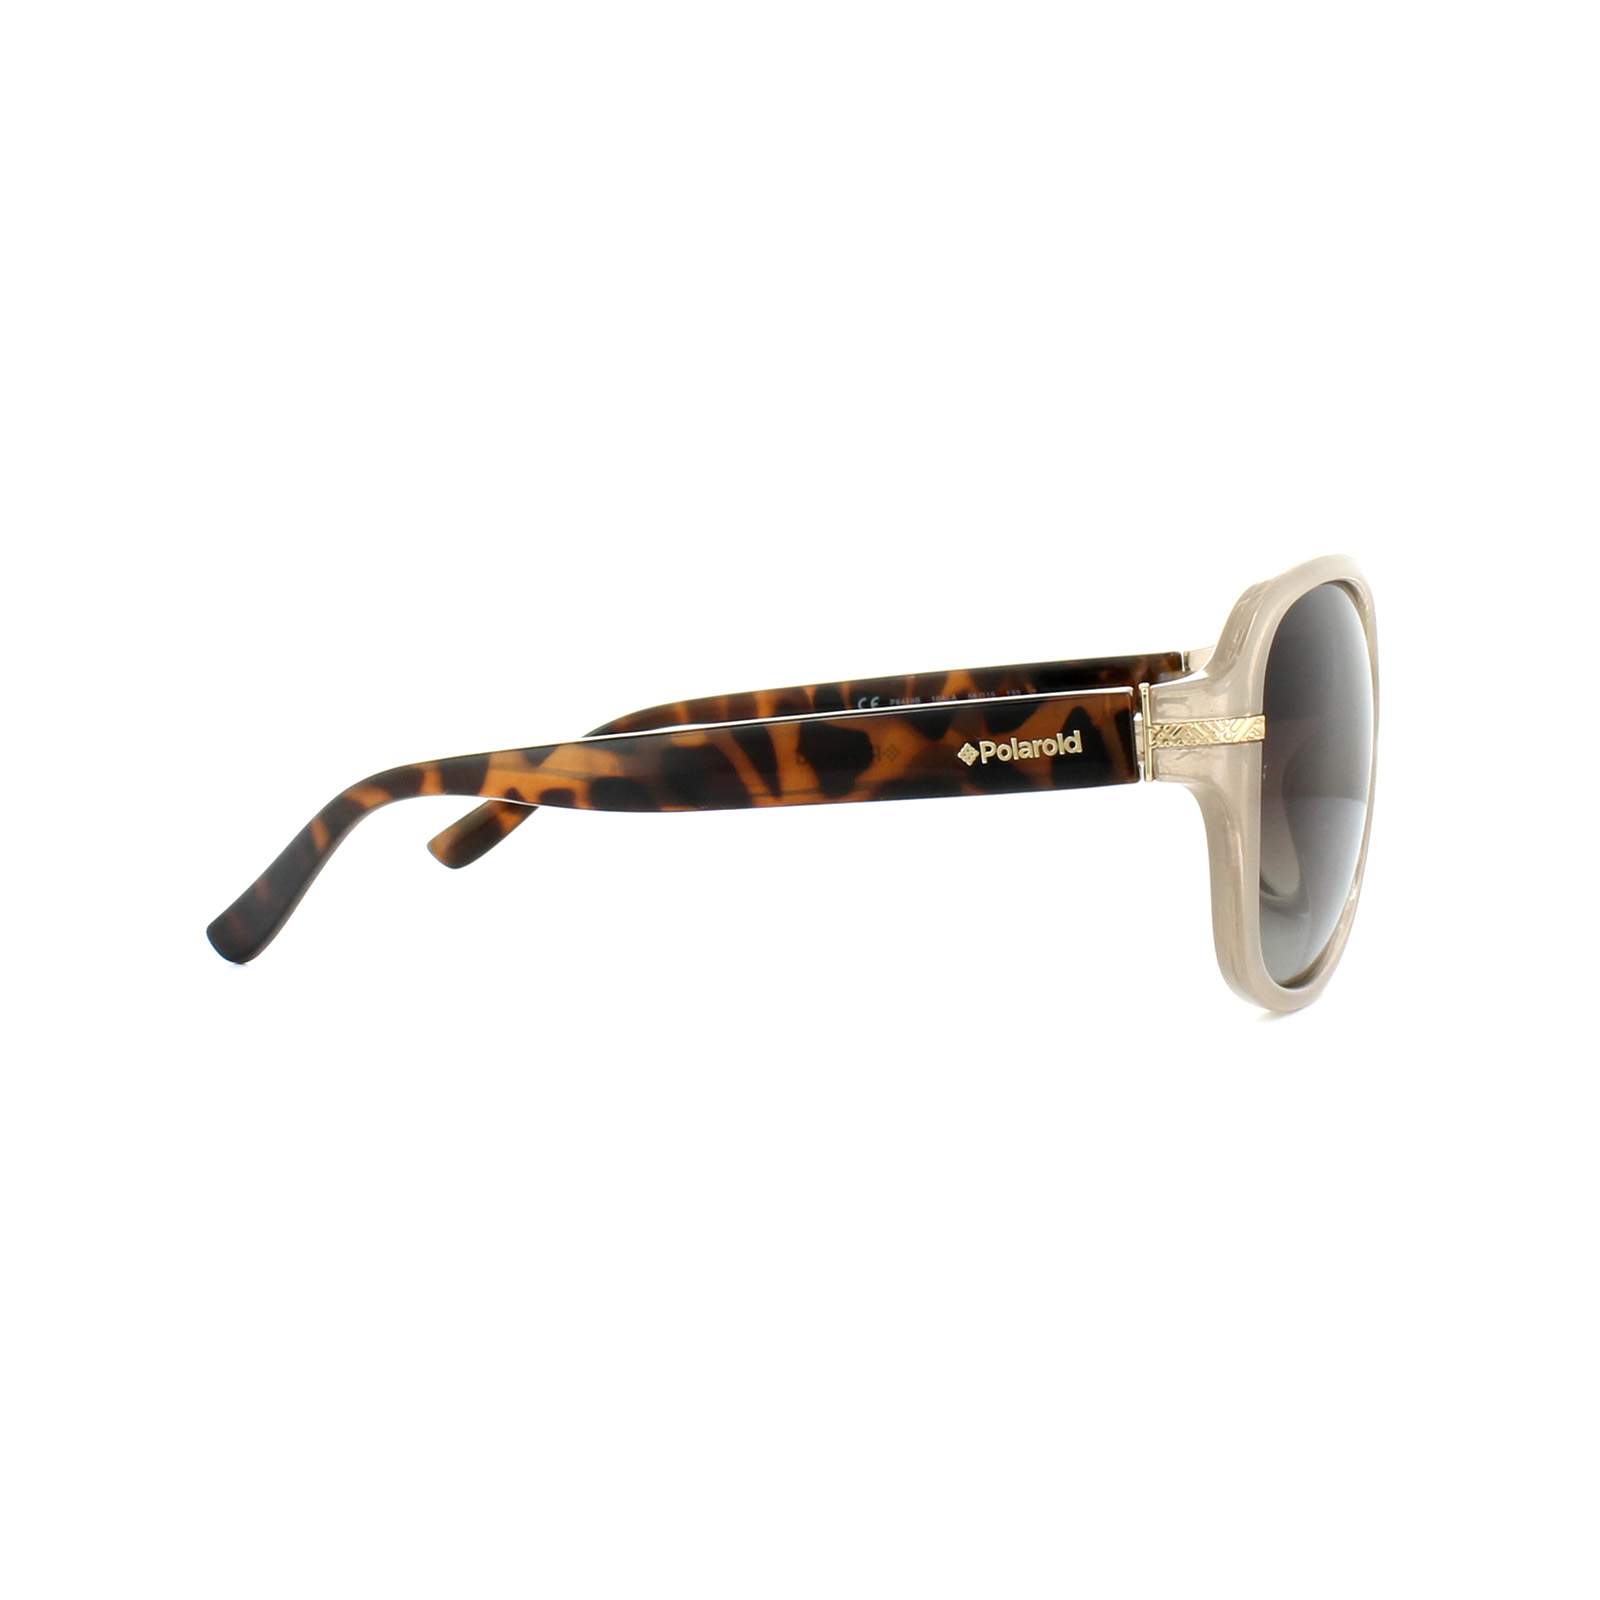 d635898ff9cb9c Sentinel Polaroid Sunglasses P8419 10A LA Beige Havana Brown Gradient  Polarized